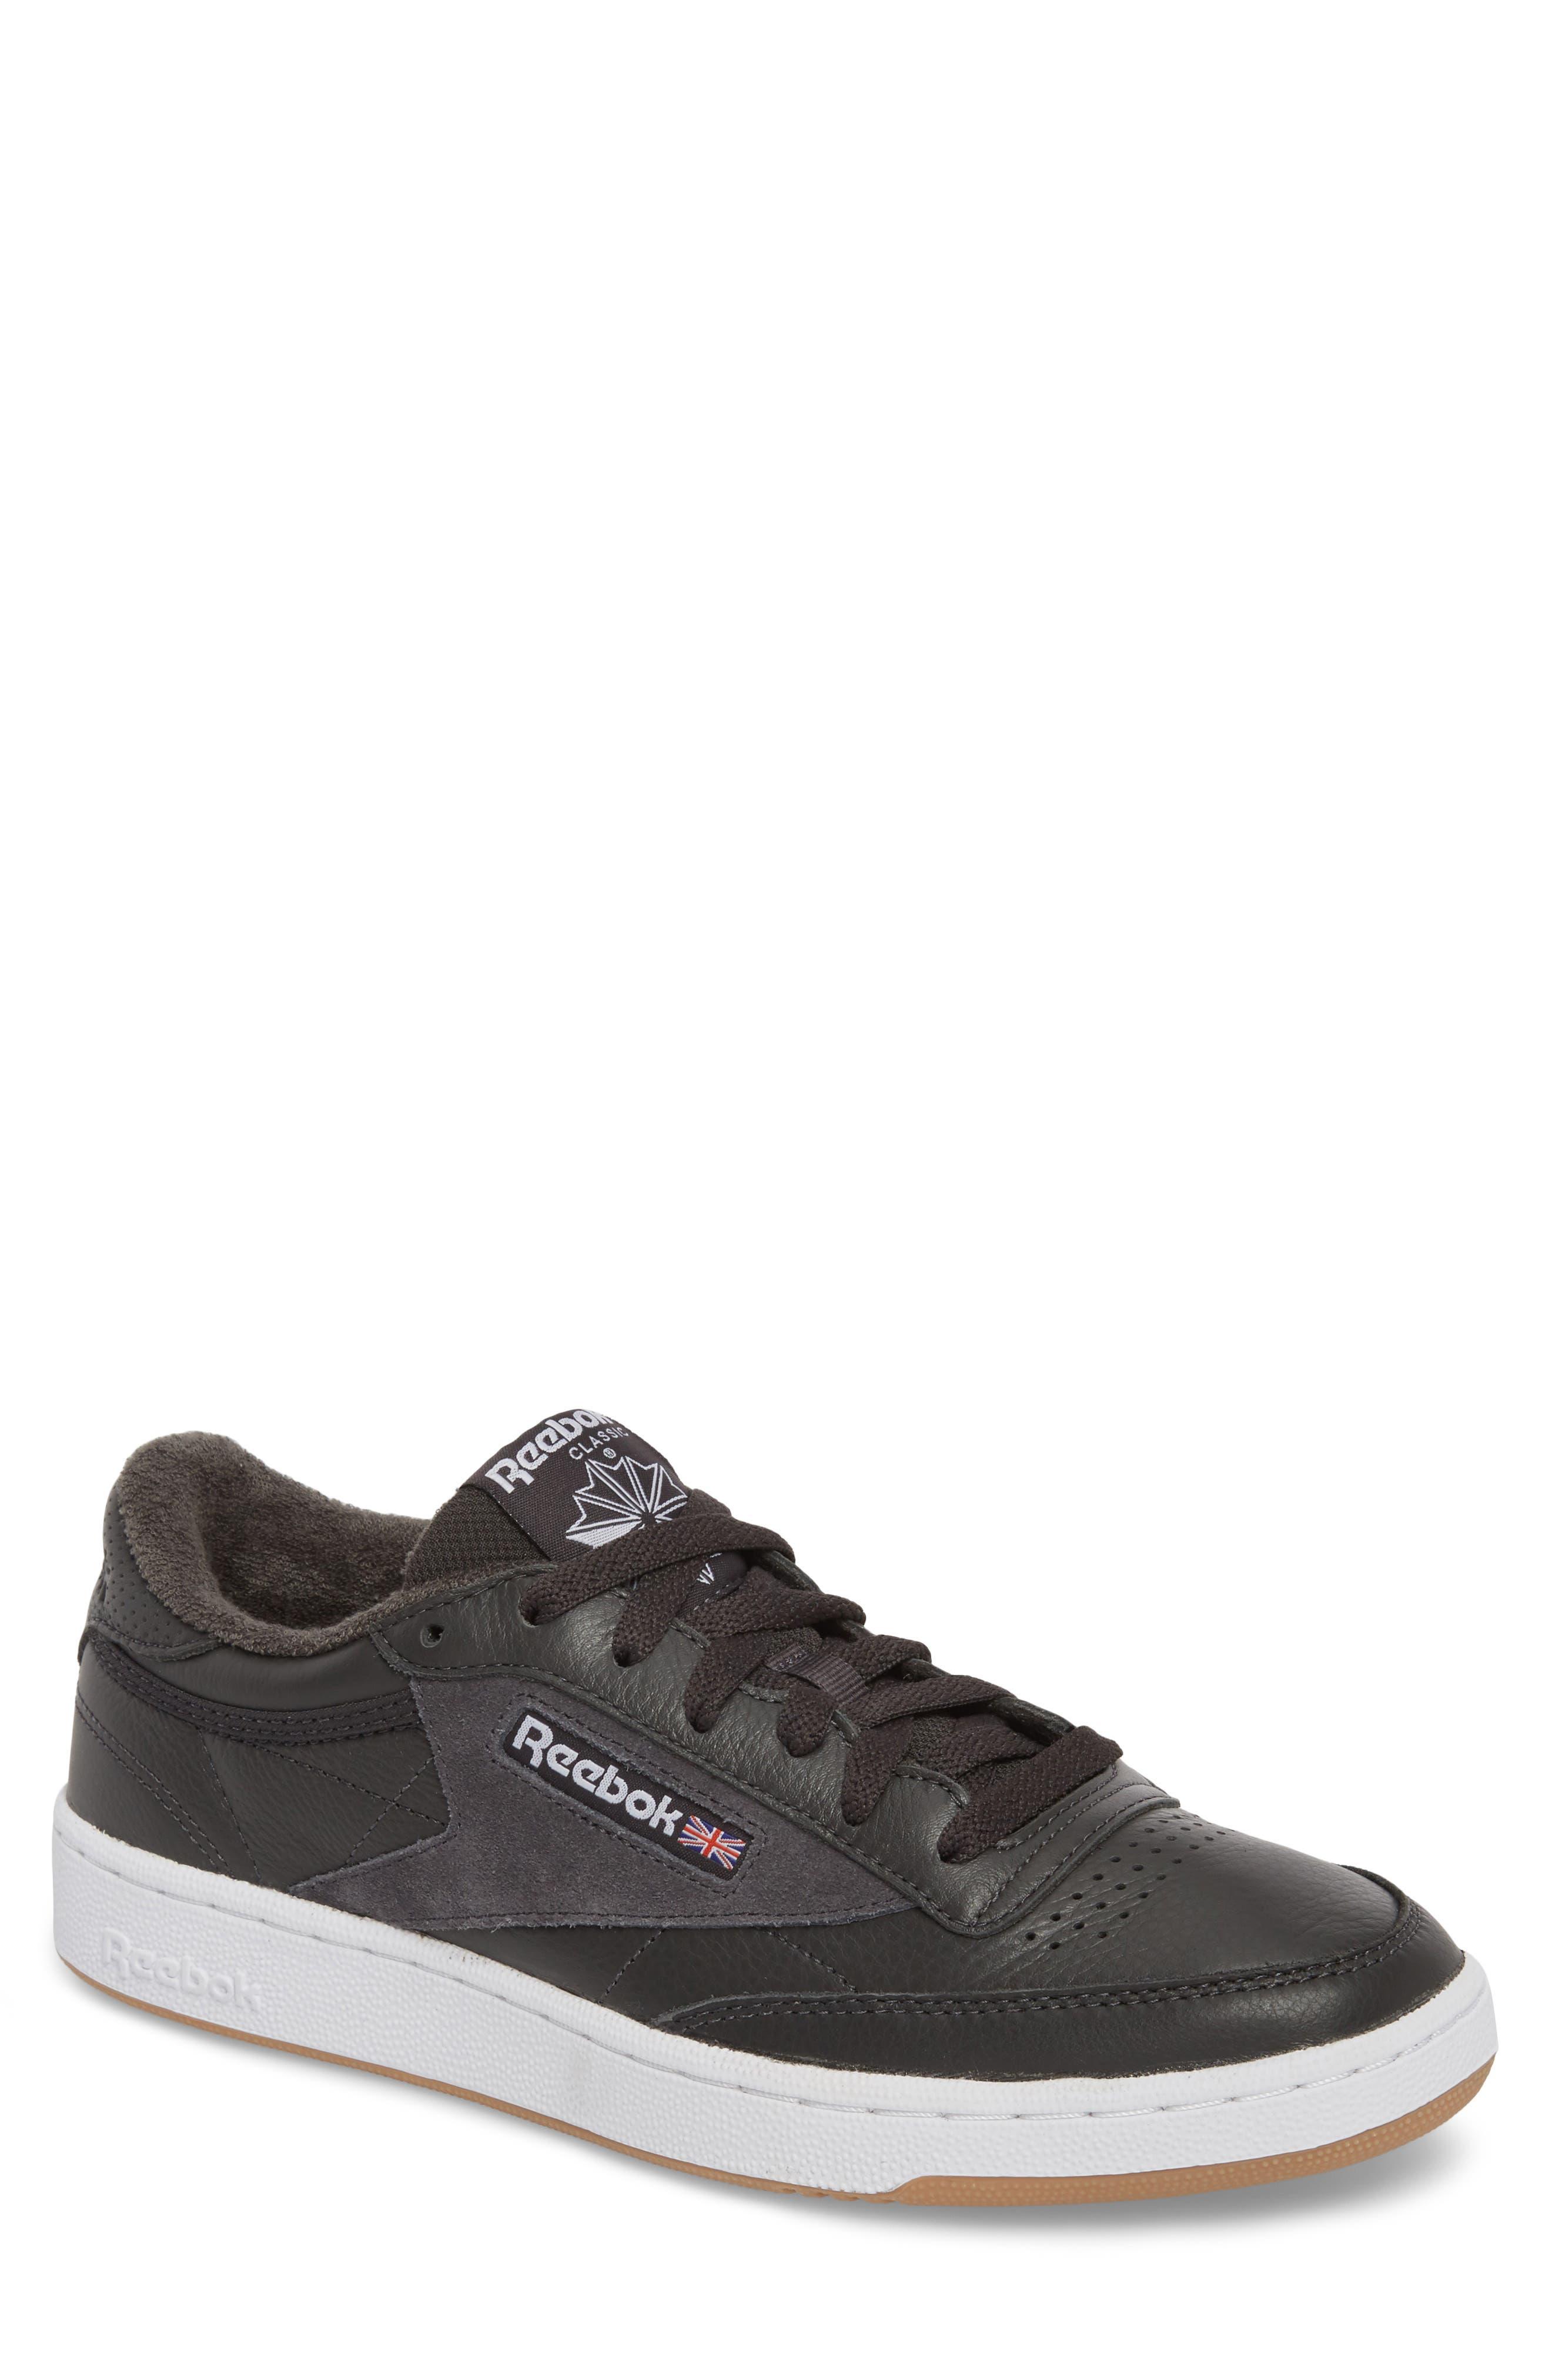 Club C 85 ESTL Sneaker,                         Main,                         color, Coal/ White/ Washed Blue